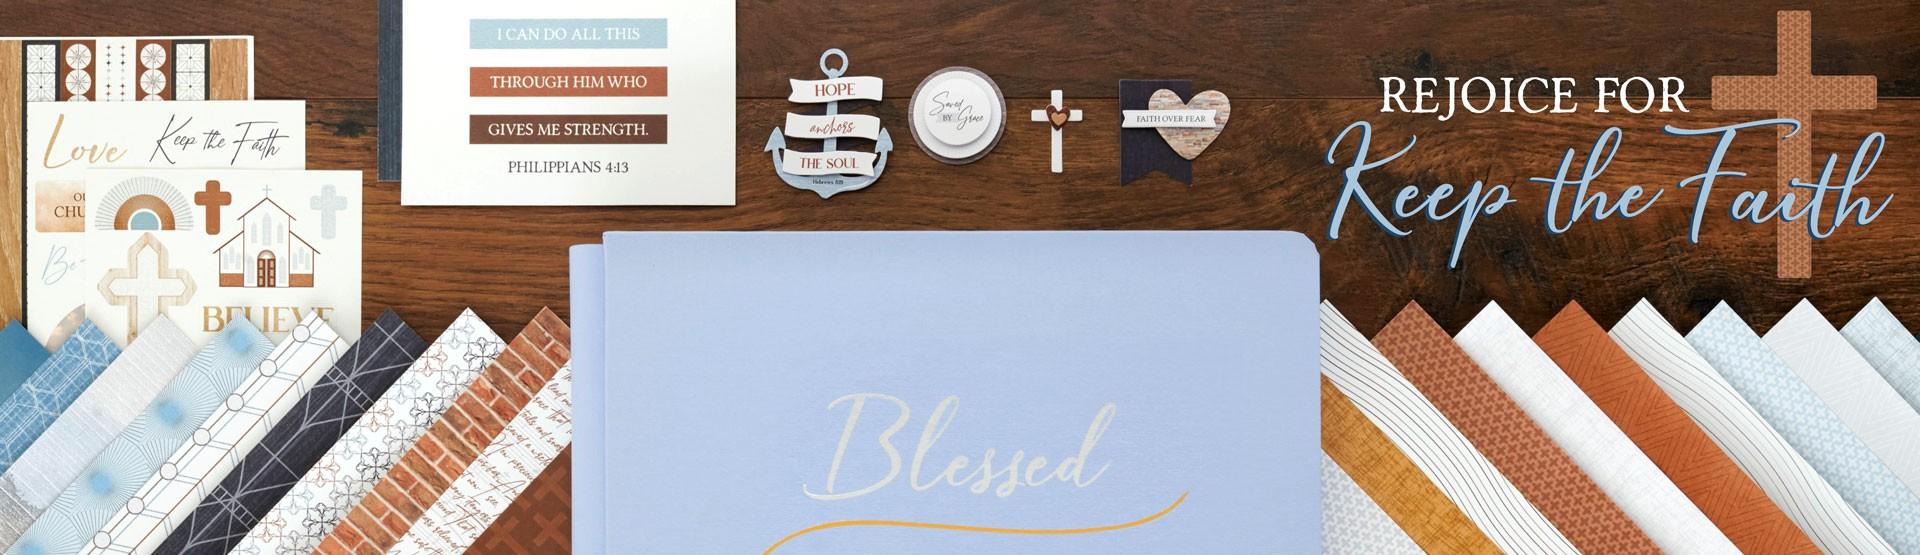 Religious Scrapbooking Supplies: Keep the Faith